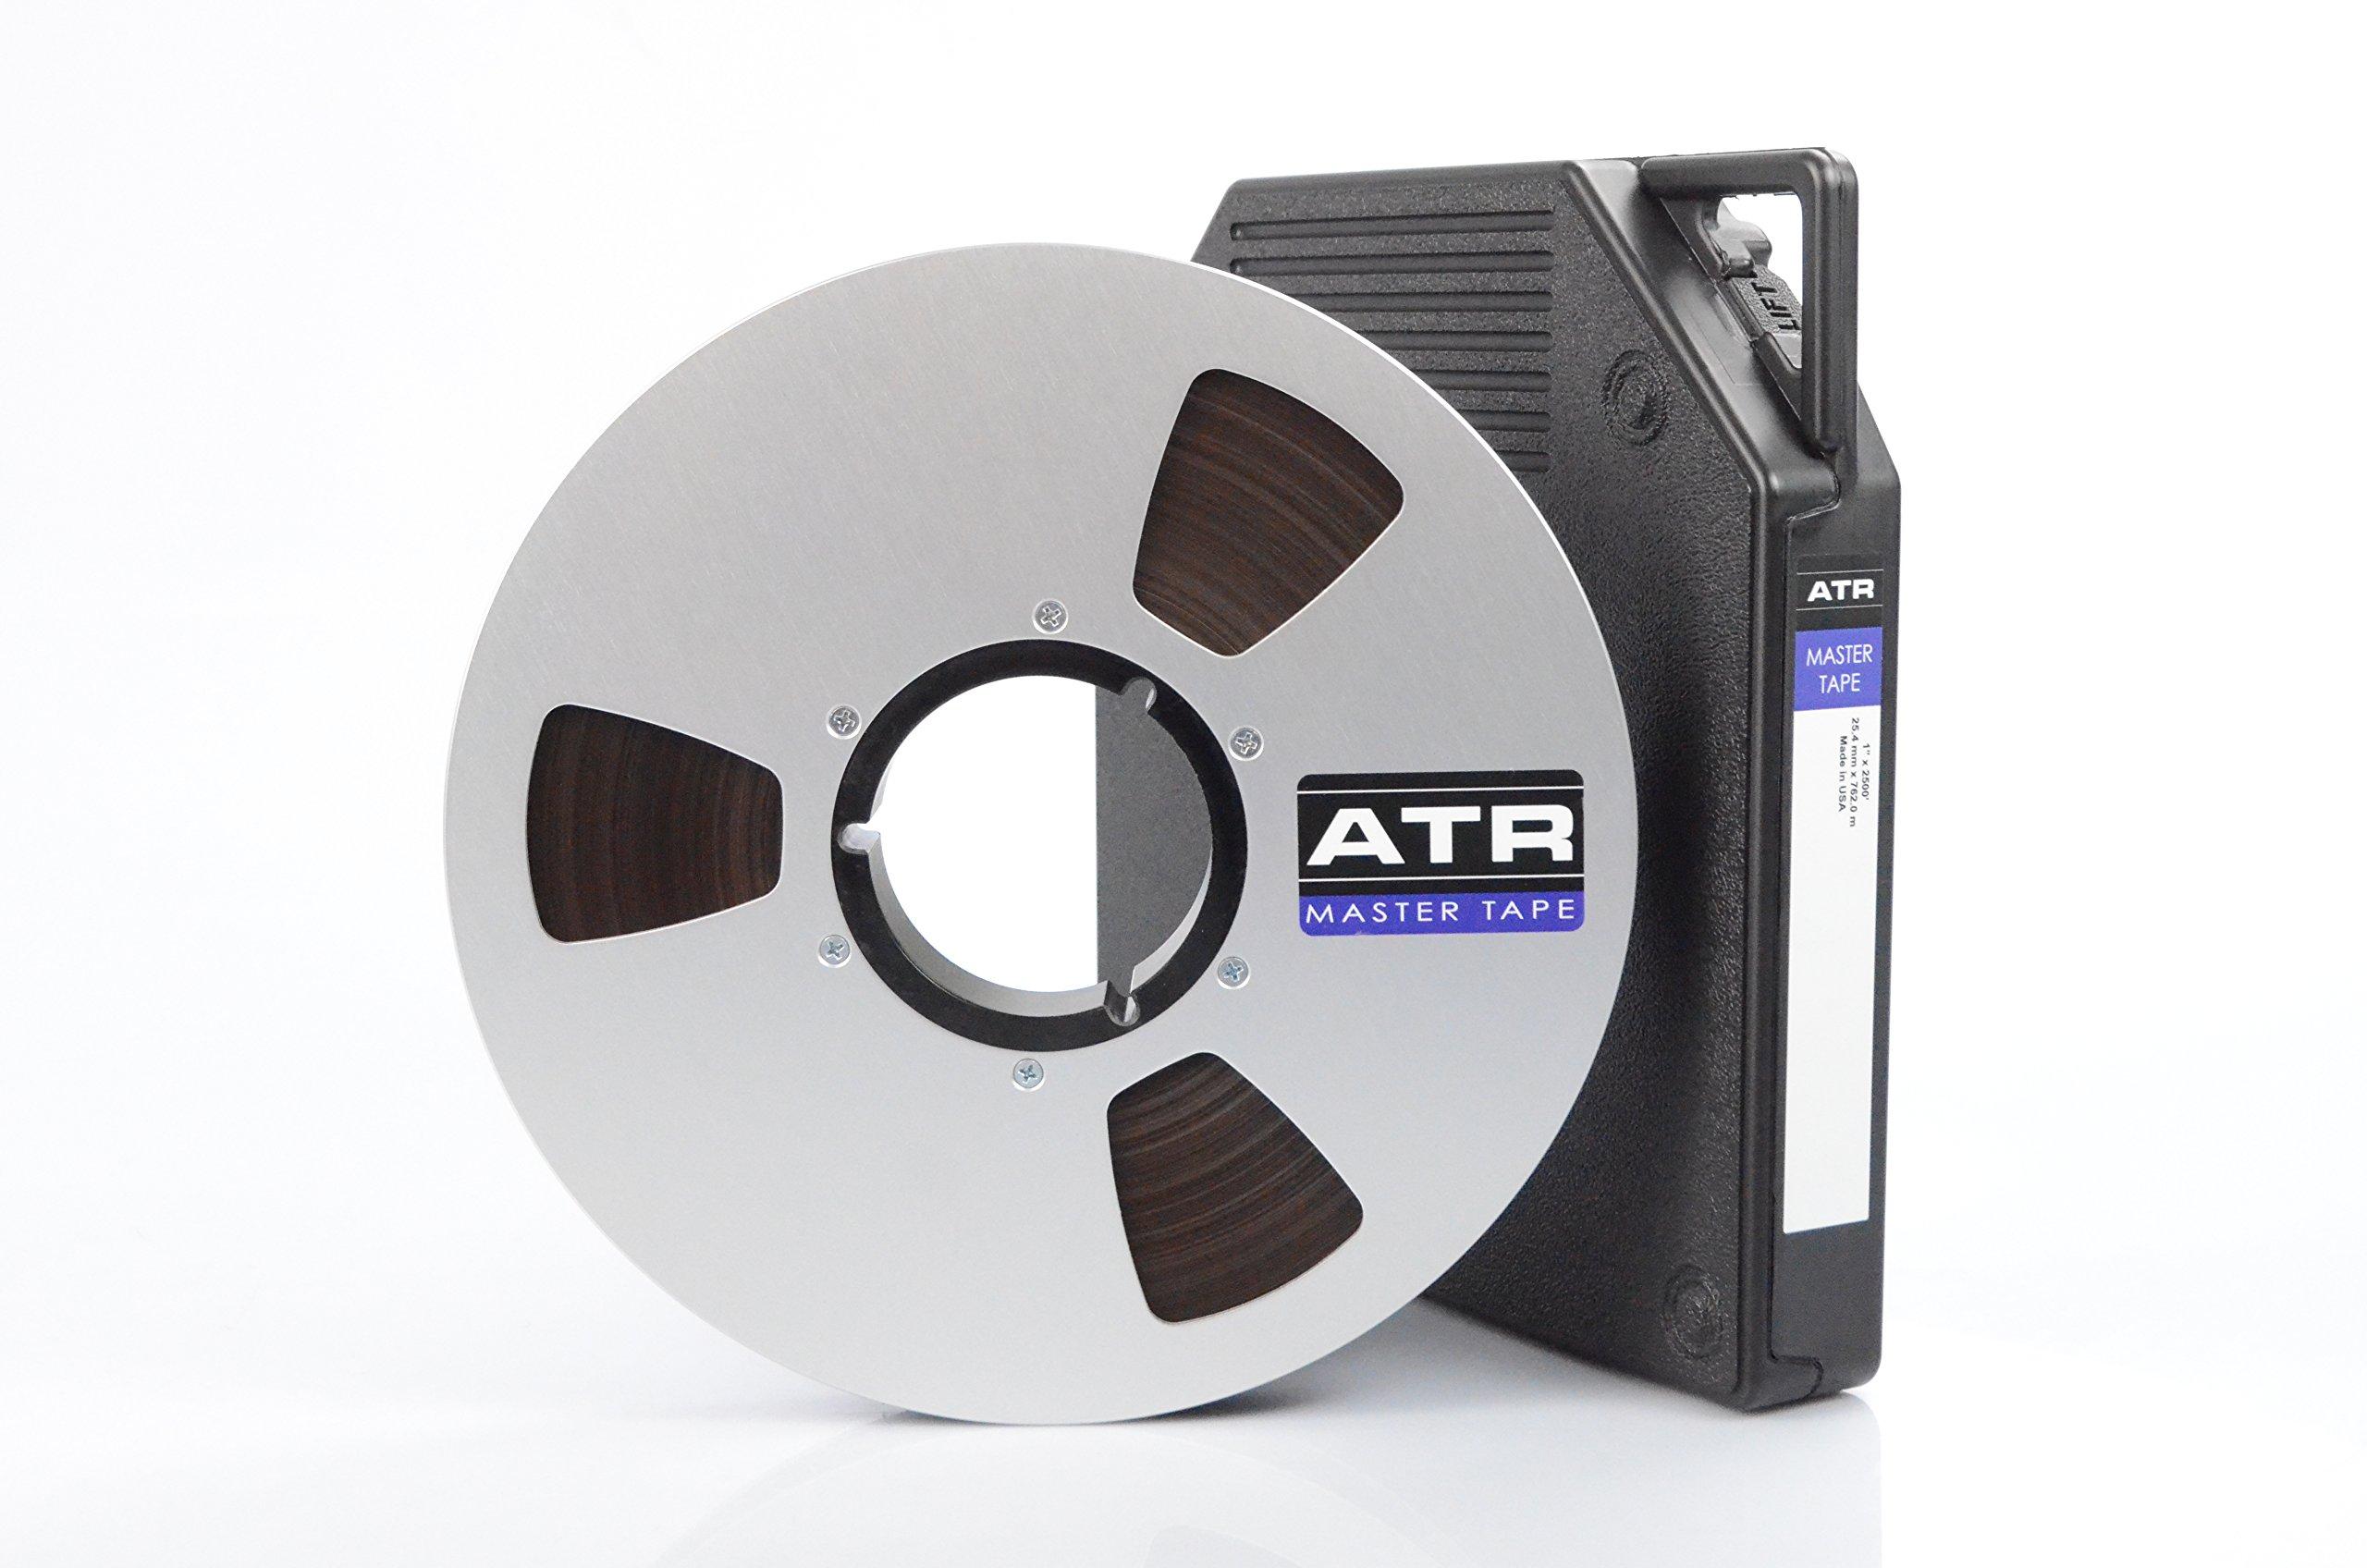 "Premium Analog Recording Tape by ATR Magnetics   1"" Master Tape - Modern Classic Sound   10.5"" Precision Reel   2500' of Analog Tape"